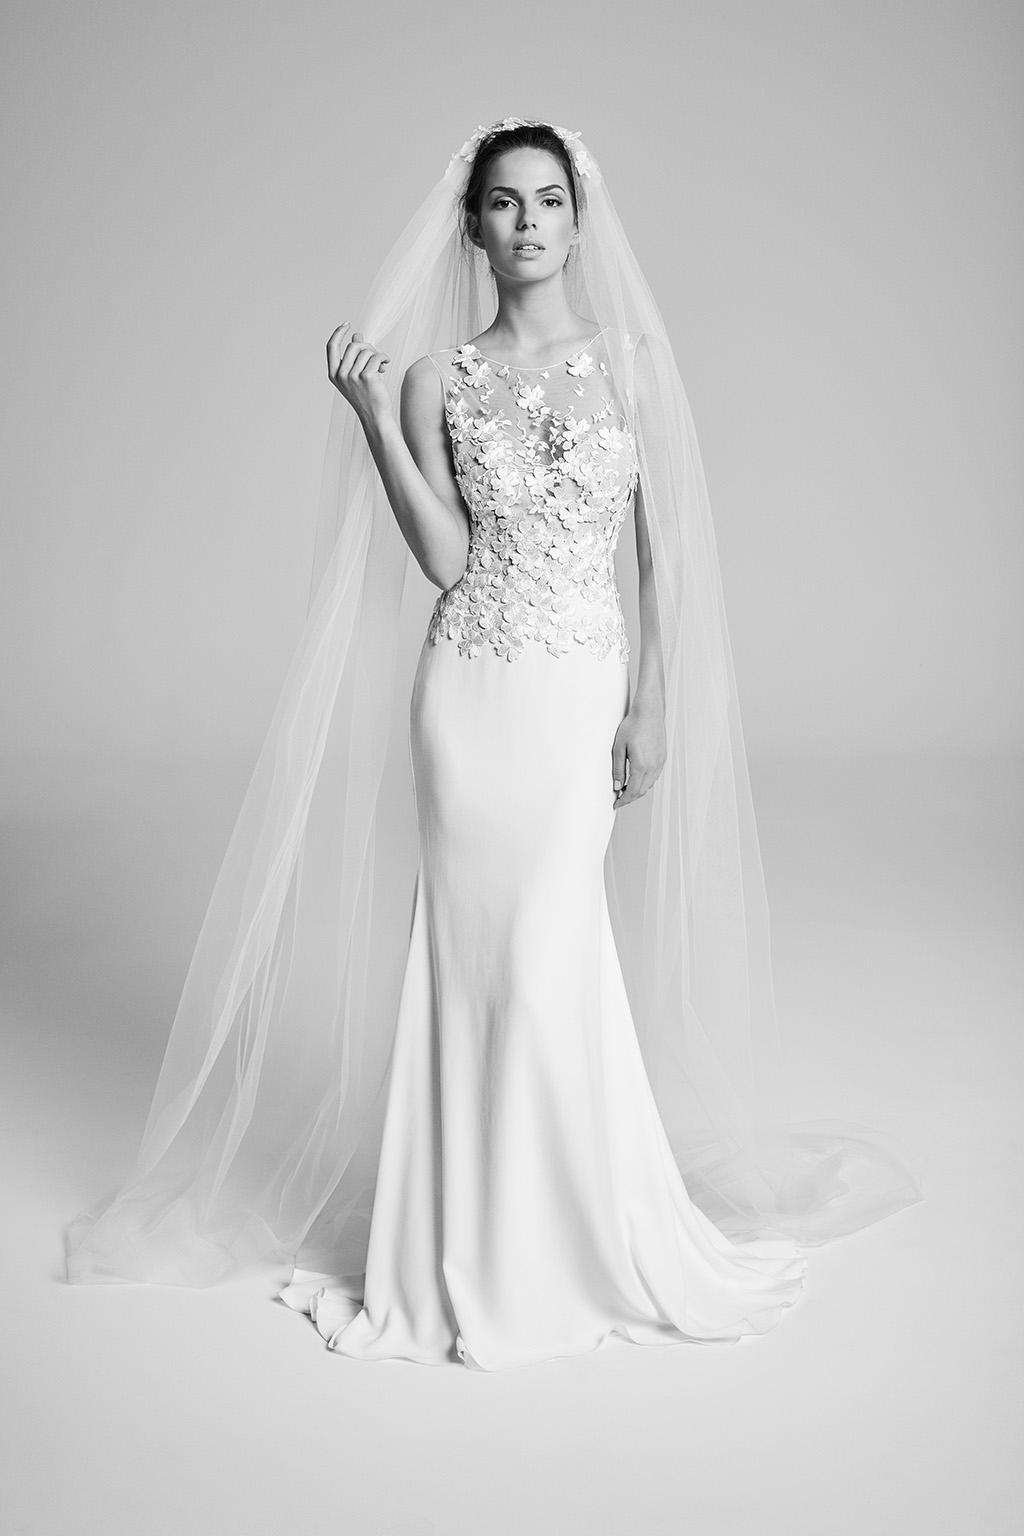 garland-bridalcouture-wedding-dresses-uk-belle-epoque-collection-2018-by-designer-suzanne-neville